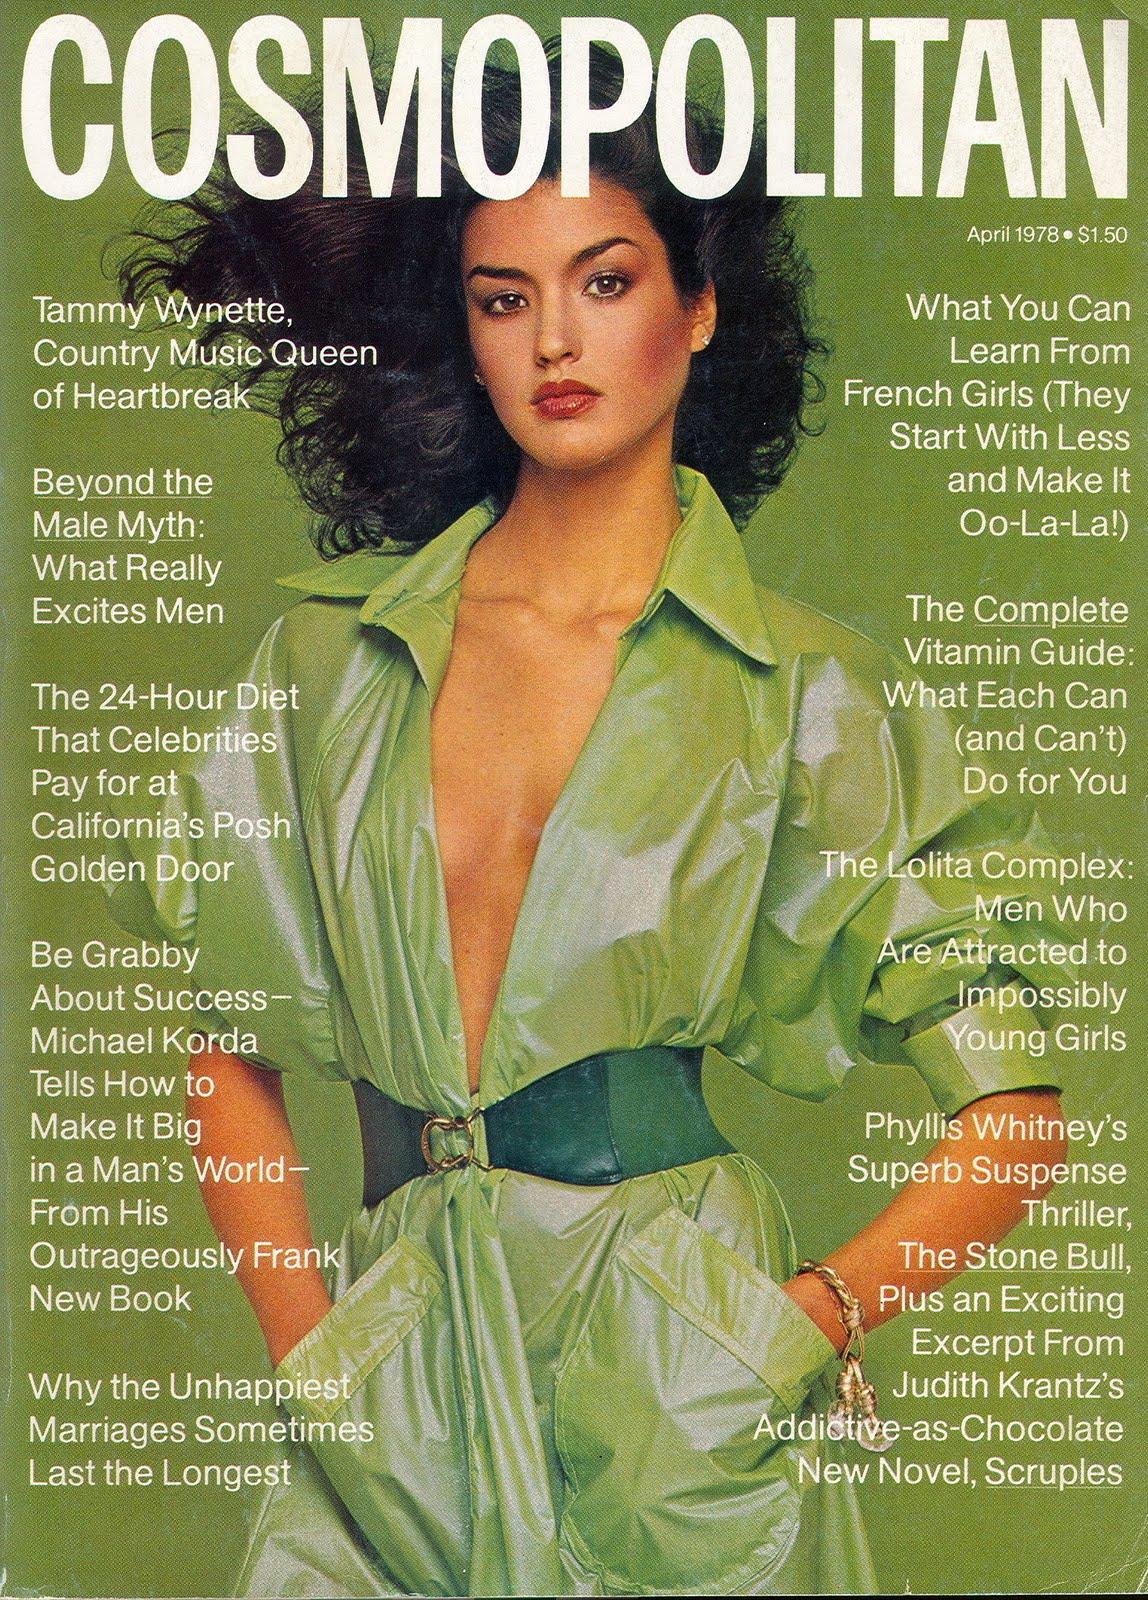 http://4.bp.blogspot.com/-2Z_yKNGUjAo/T0KKRi7Qp_I/AAAAAAAAO0s/9lbt5S8As3c/s1600/1978-04-cosmo-janice+Dickinson+cover.jpg